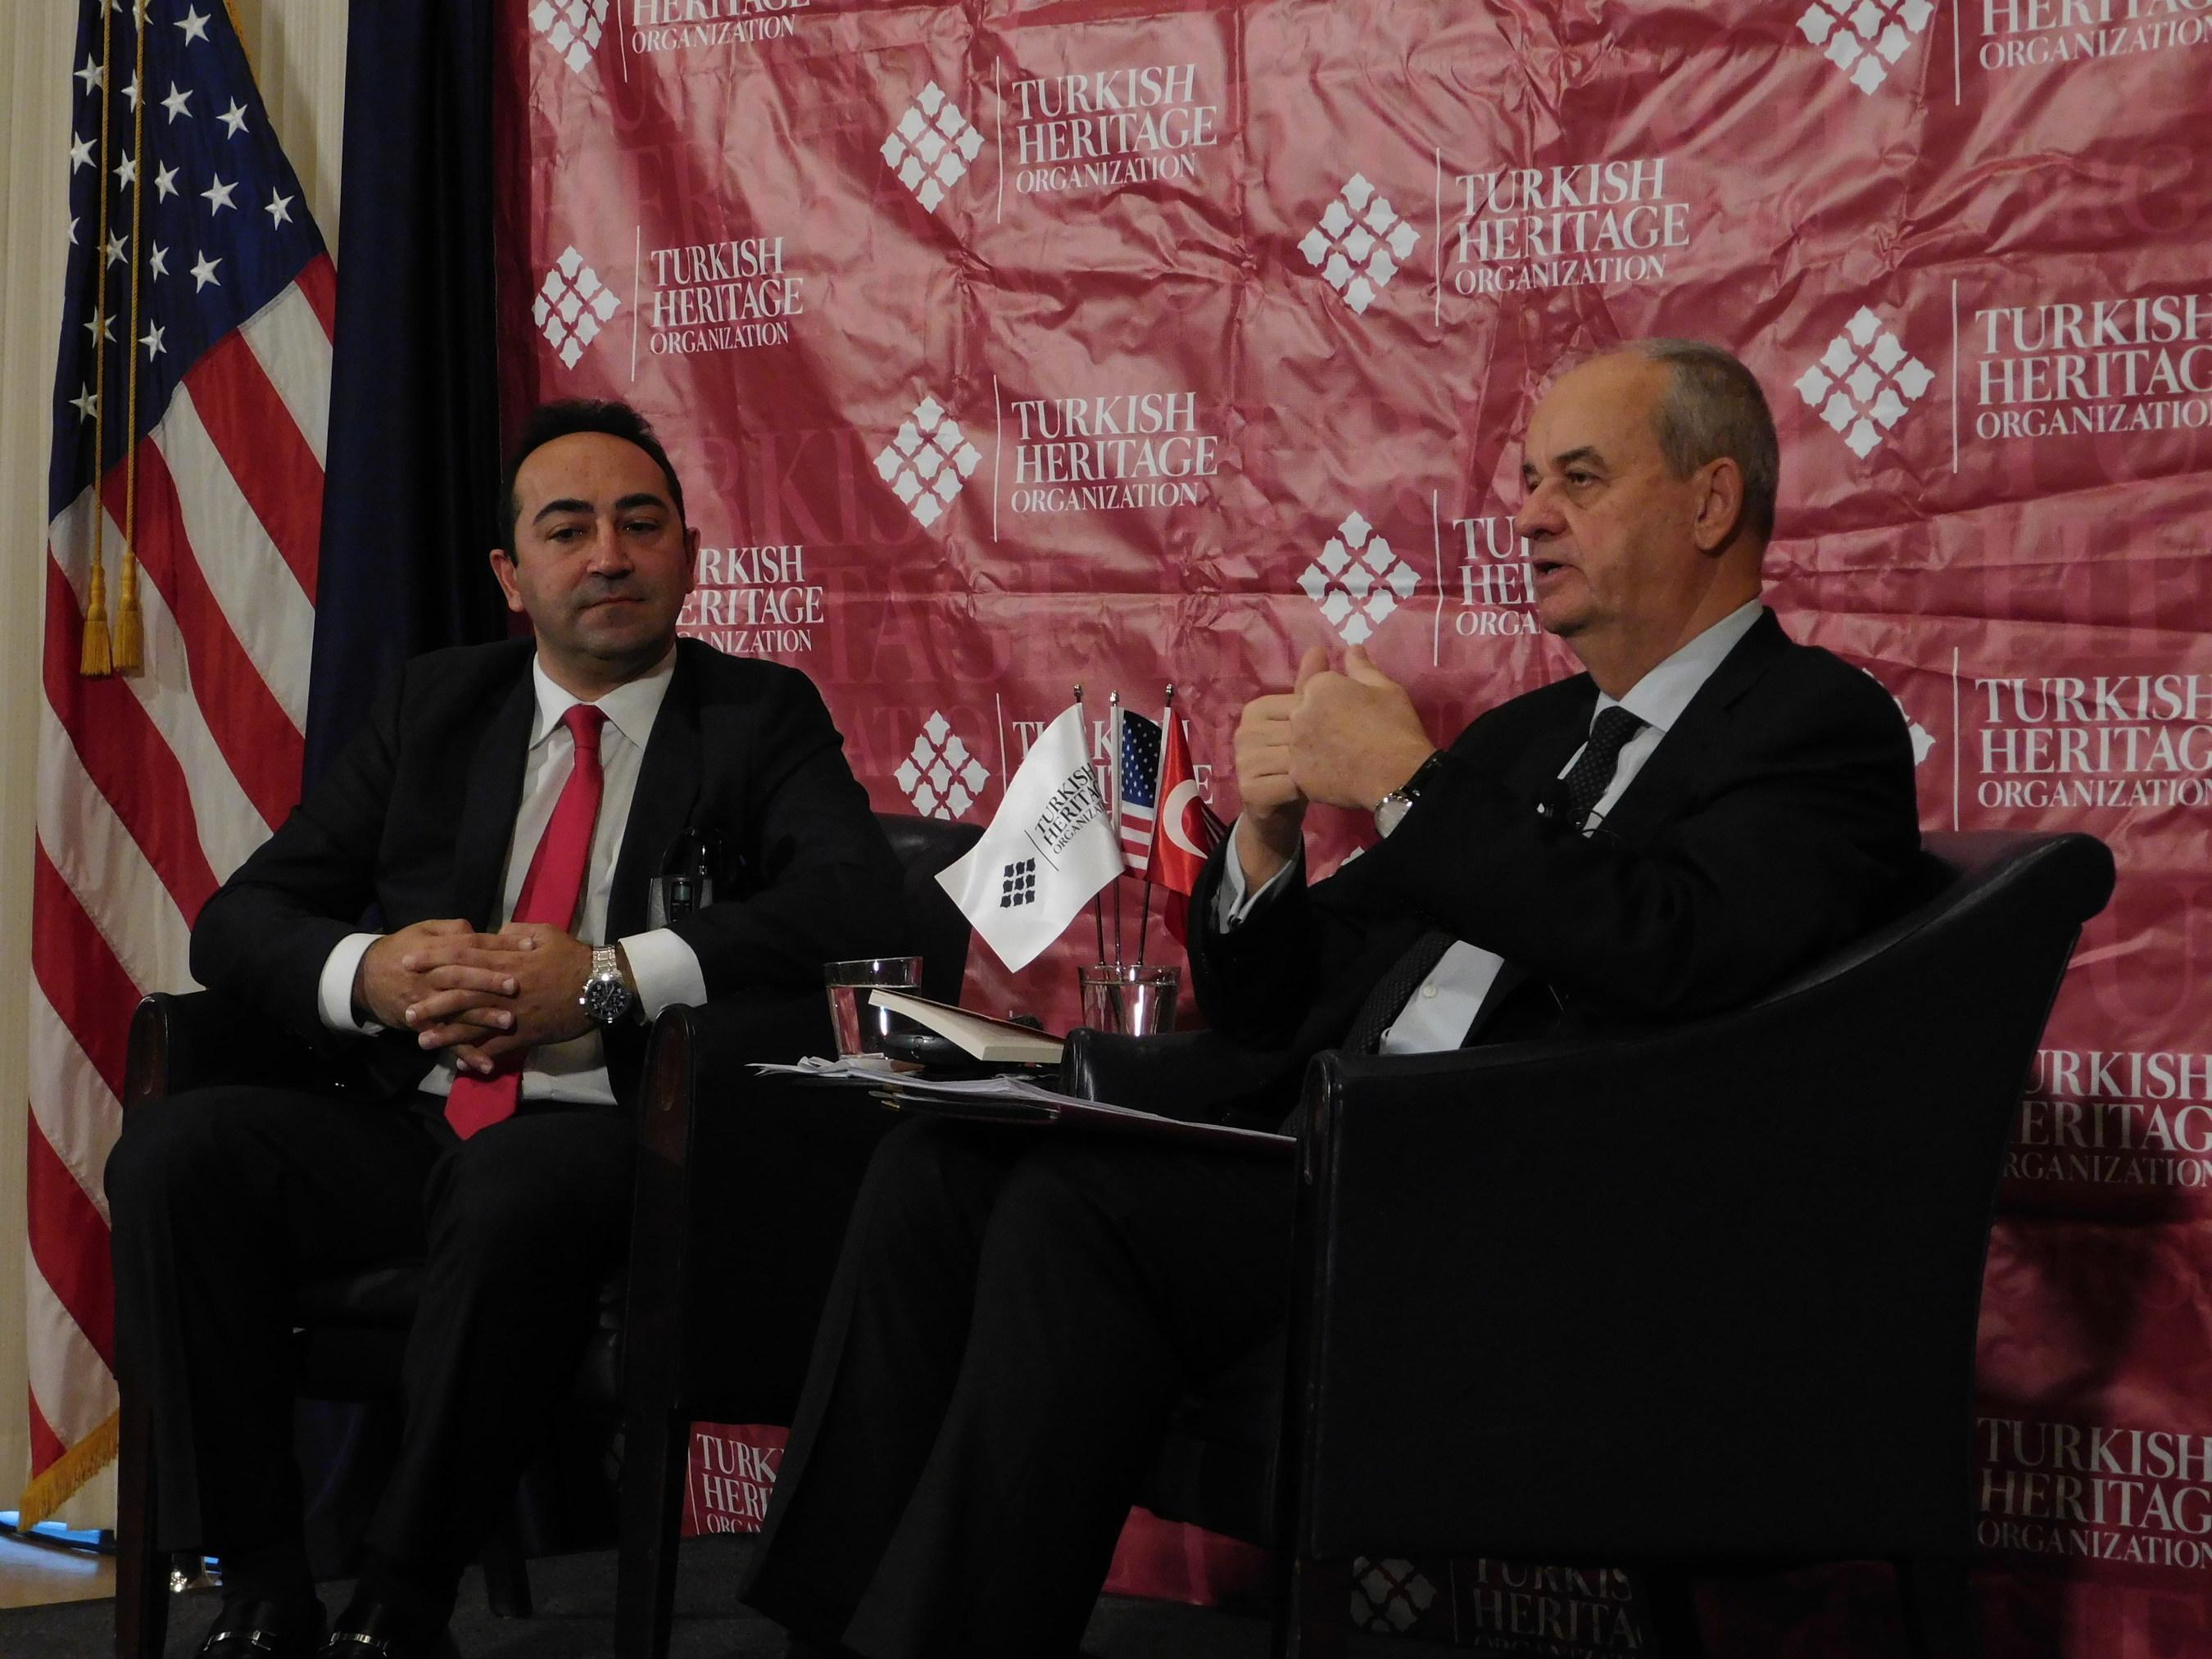 General (Ret.) Ilker Basbug (right) with Turkish Heritage Organization President Ali Cinar at the National Press Club